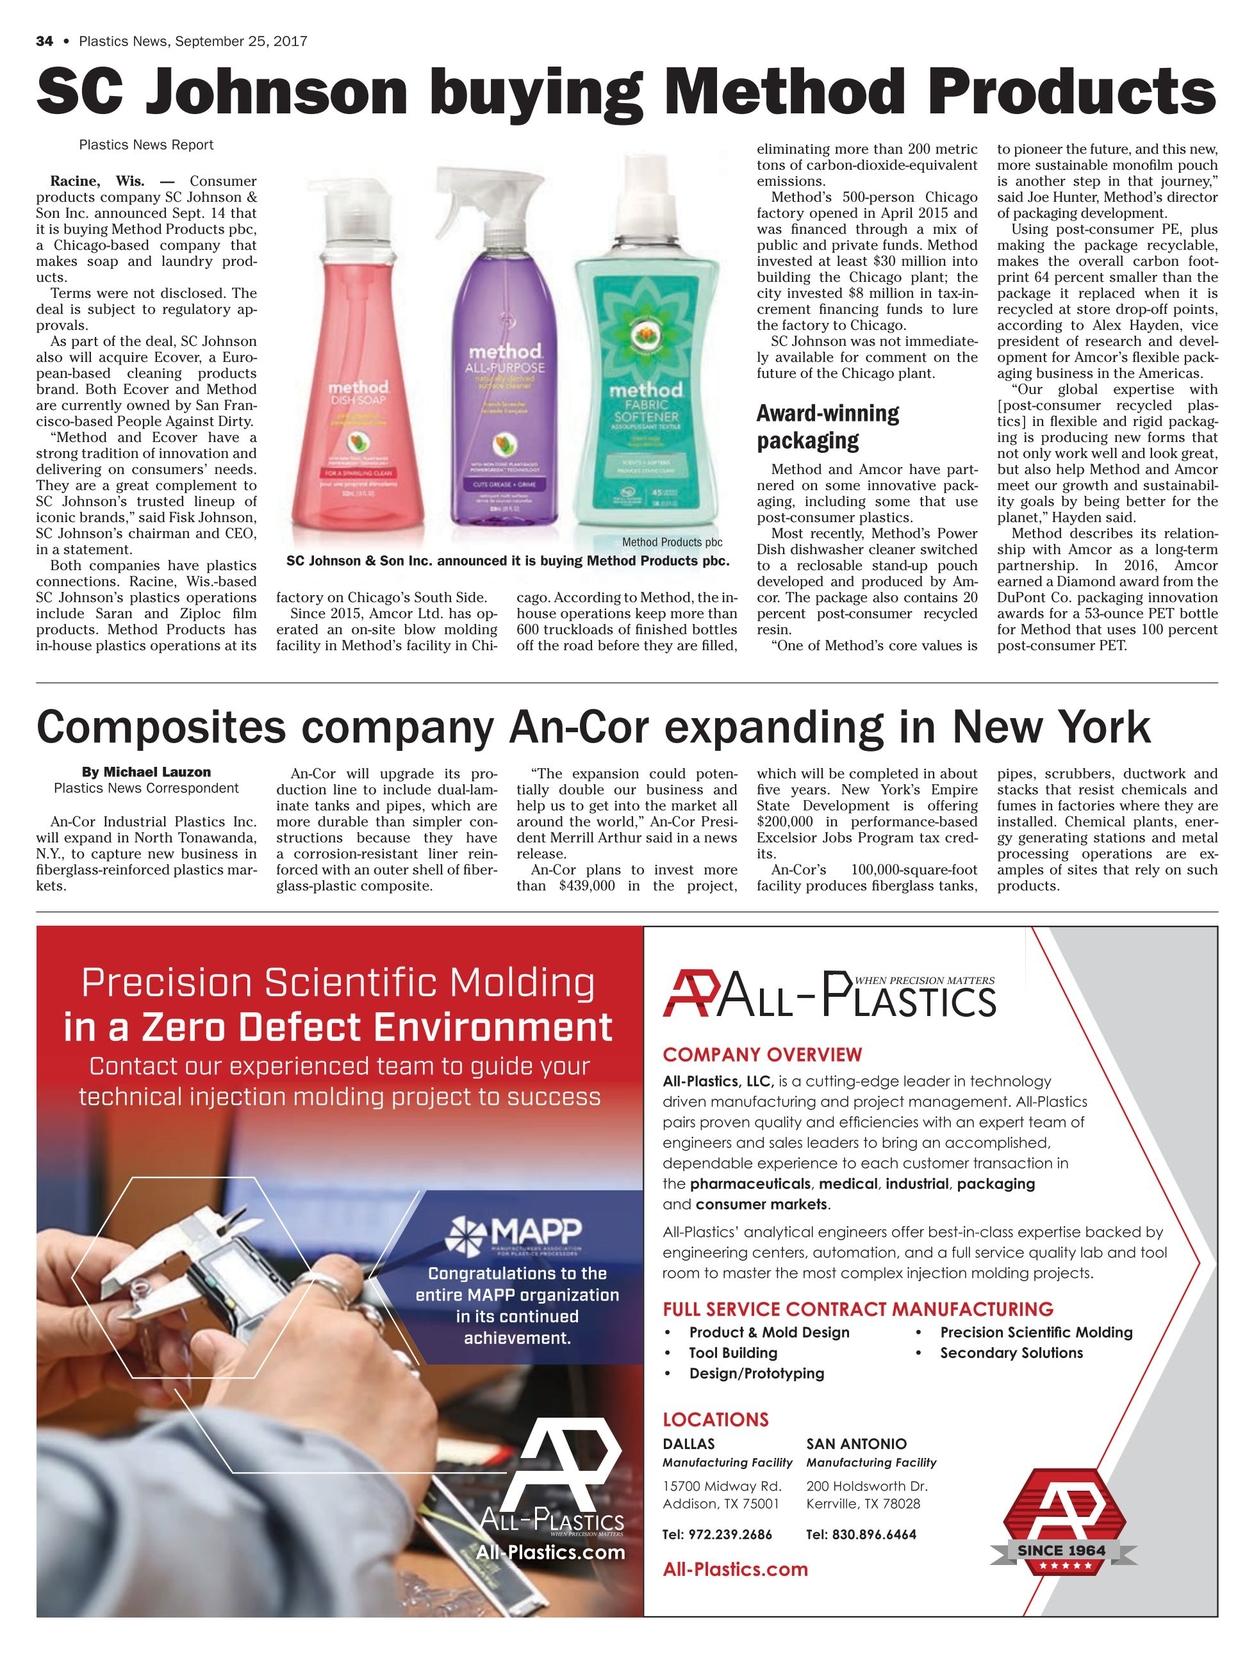 Plastics News - September 25, 2017